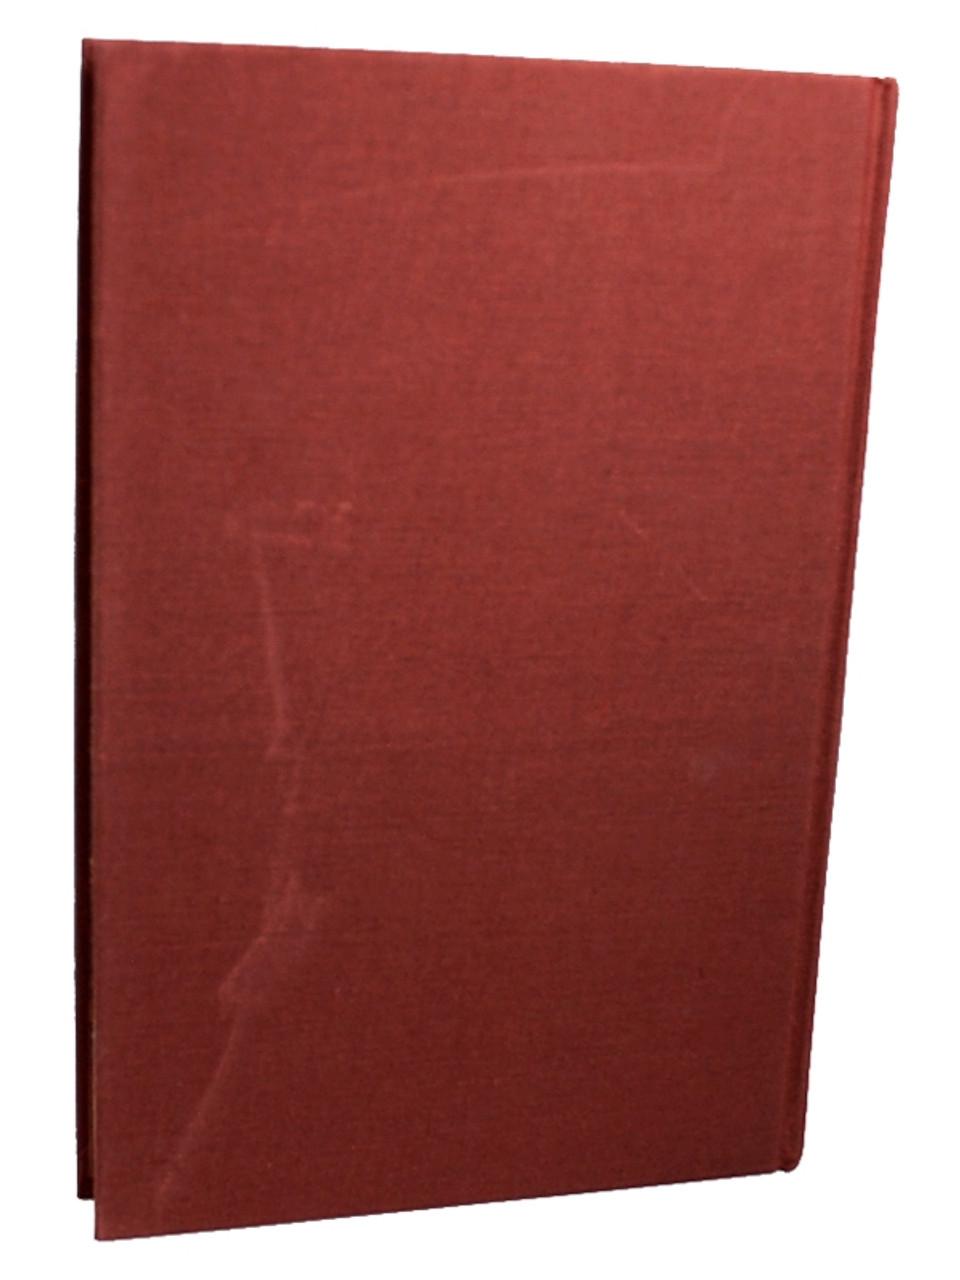 "Stephen King, ""Dark Tower: The Gunslinger"" dj/HC First Edition"